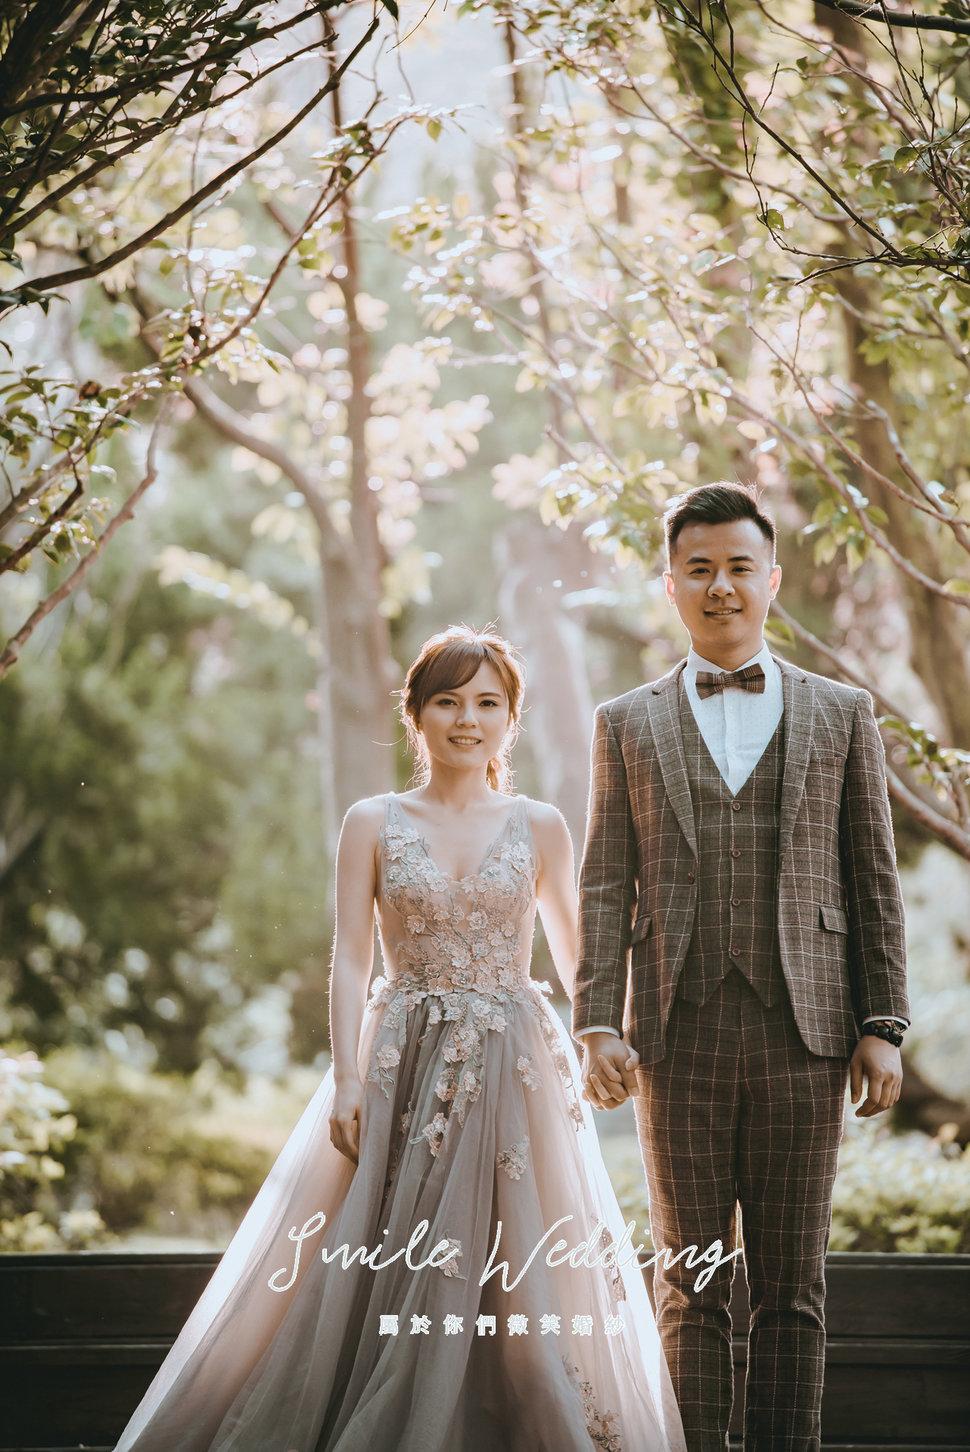 WEI_3116 - Smile wedding 微笑婚紗《結婚吧》